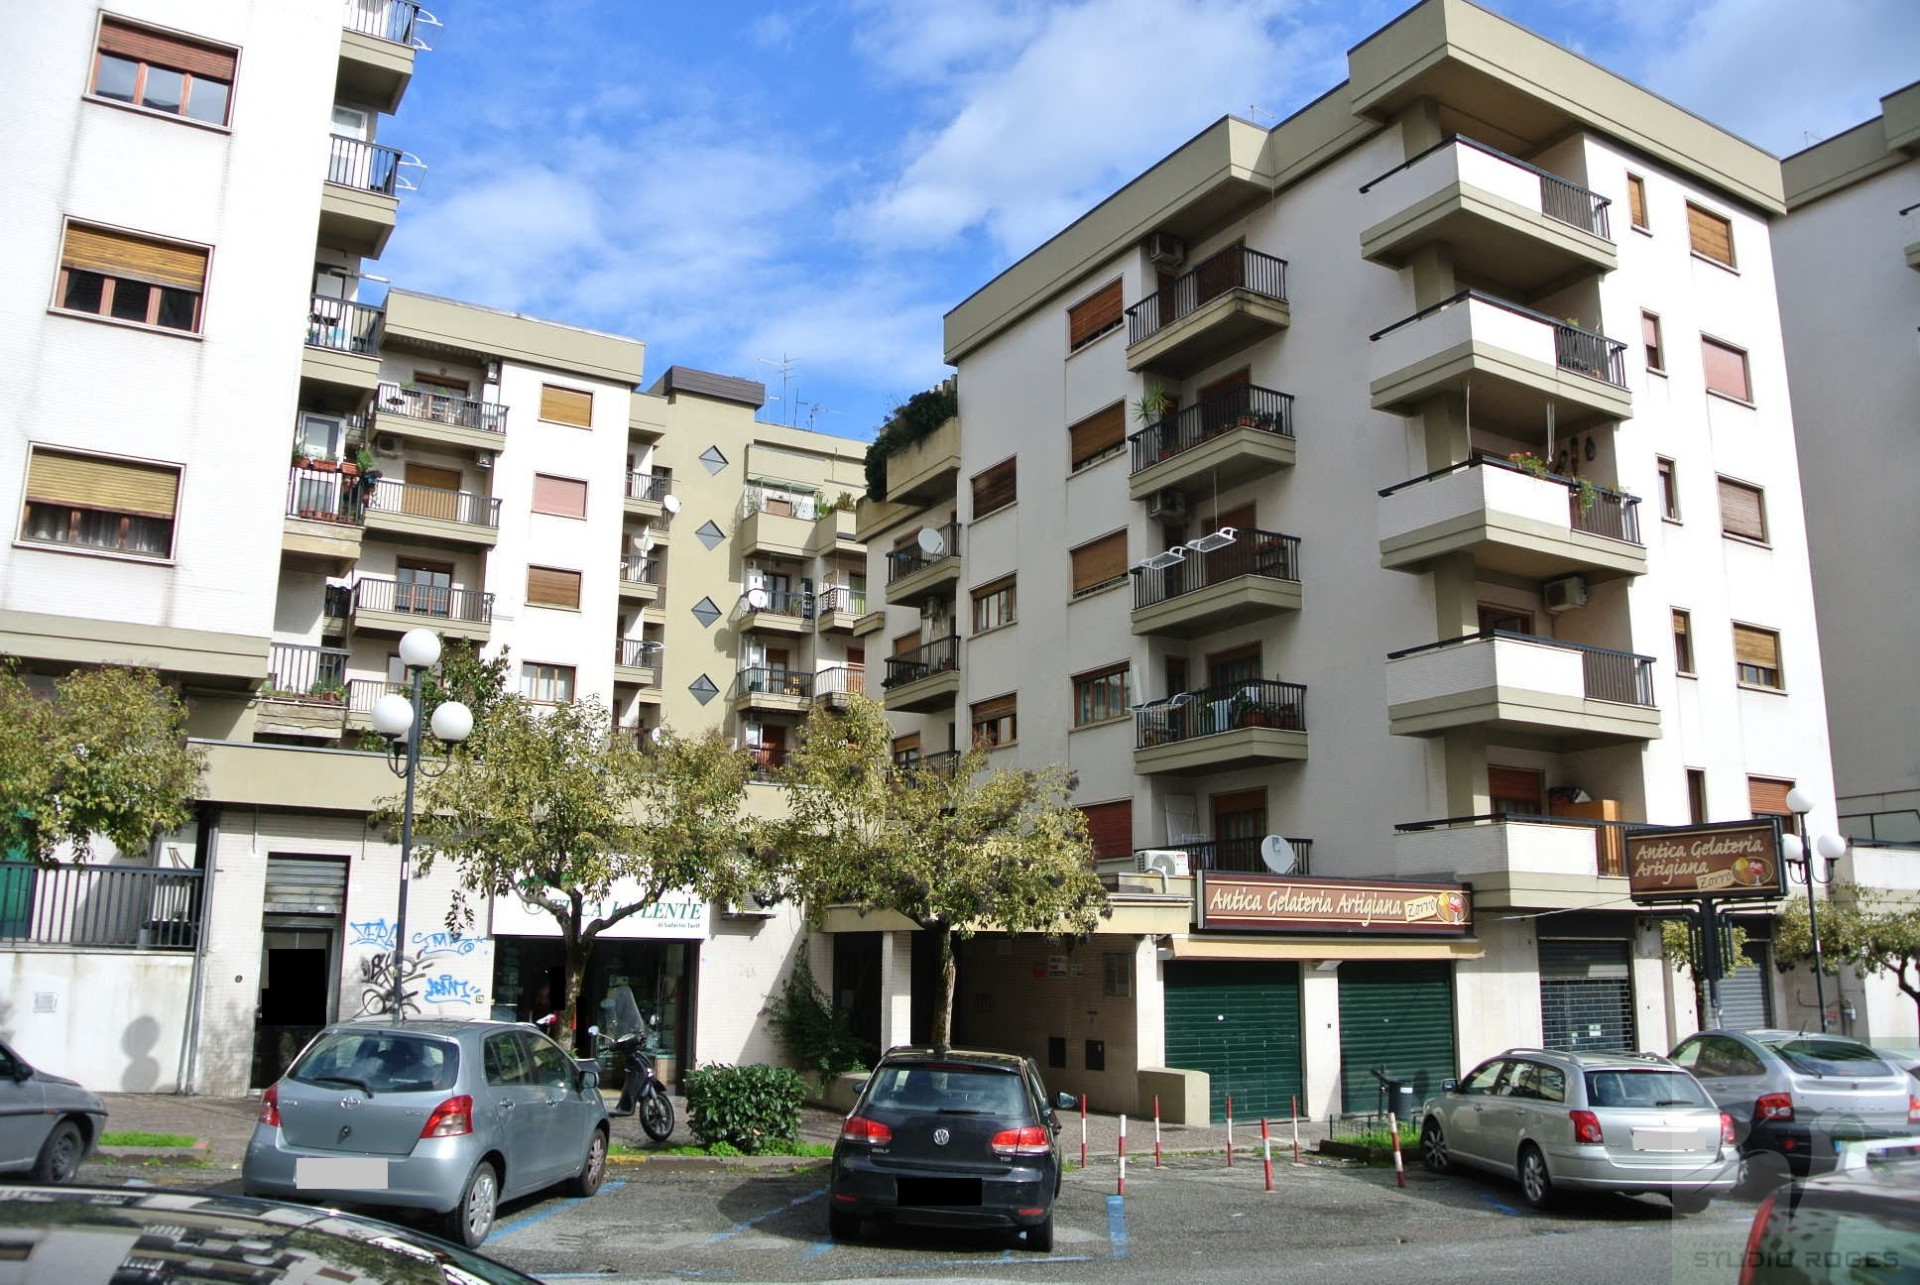 Appartamento in Vendita 185,35 mq - N. camere: 4 - - Rende - Roges-Commenda (CS)